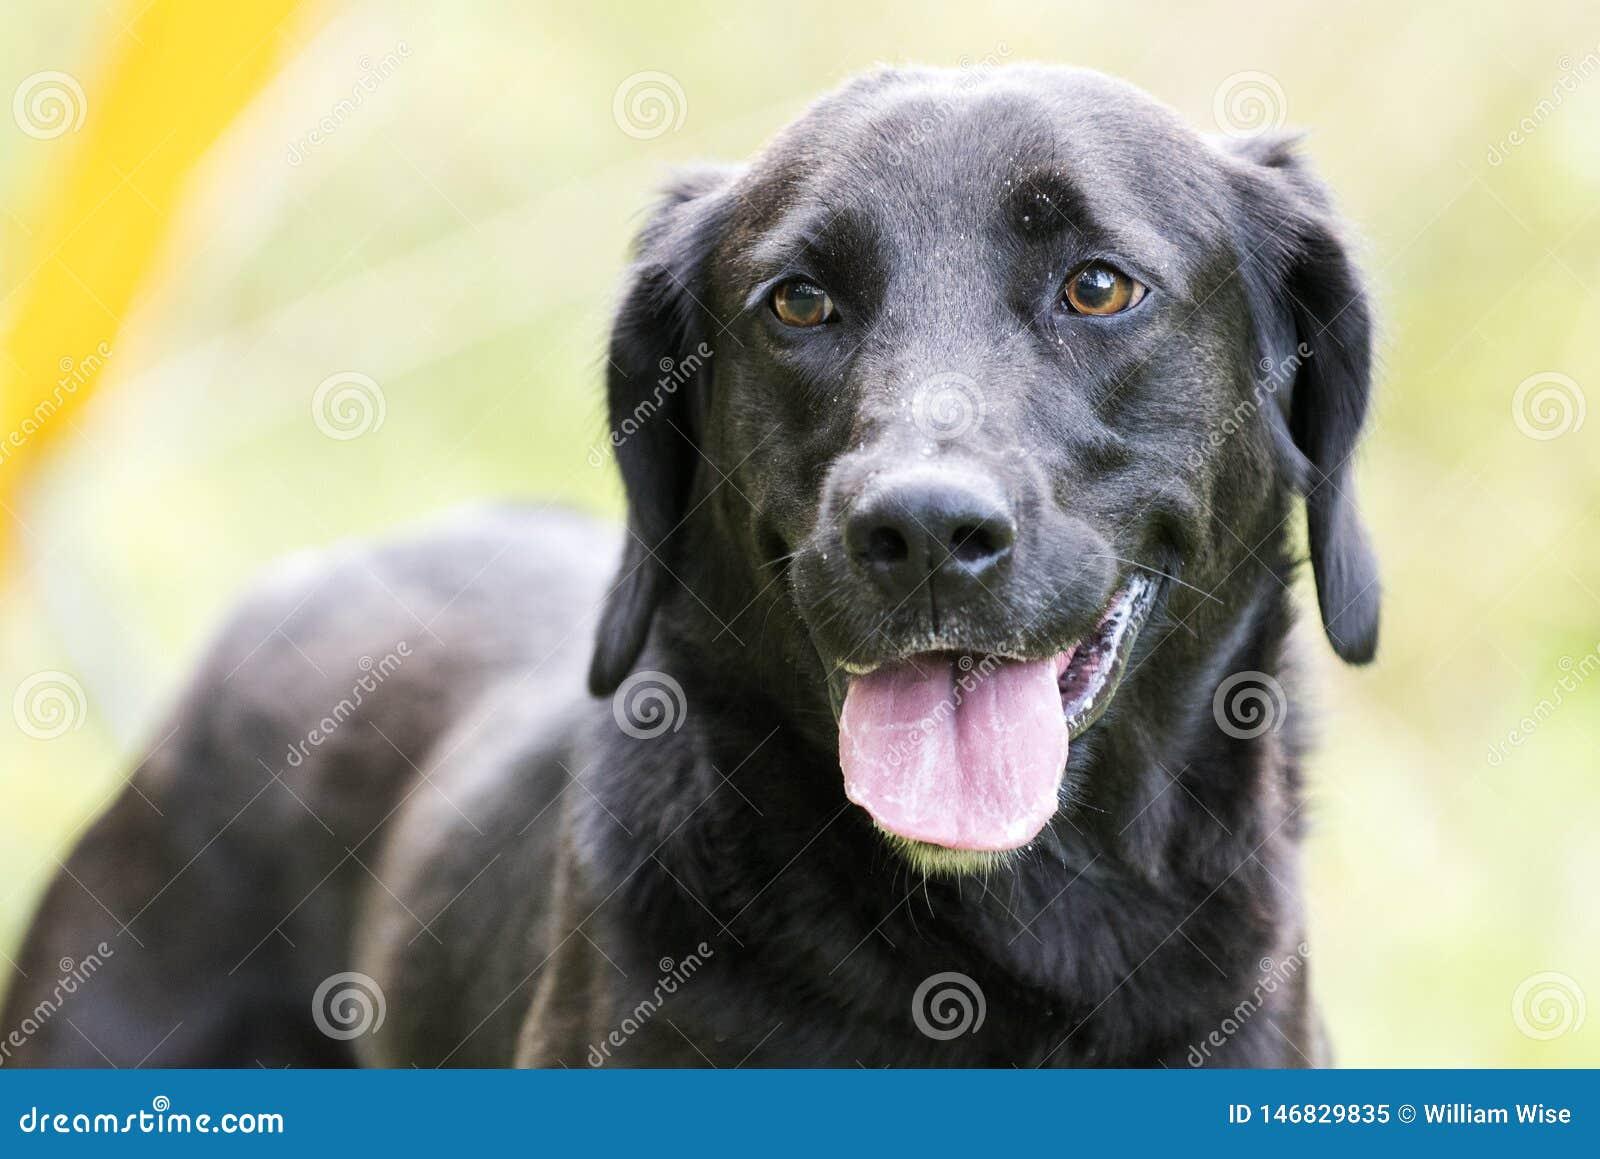 Black Labrador Retriever Dog Panting Stock Image - Image of